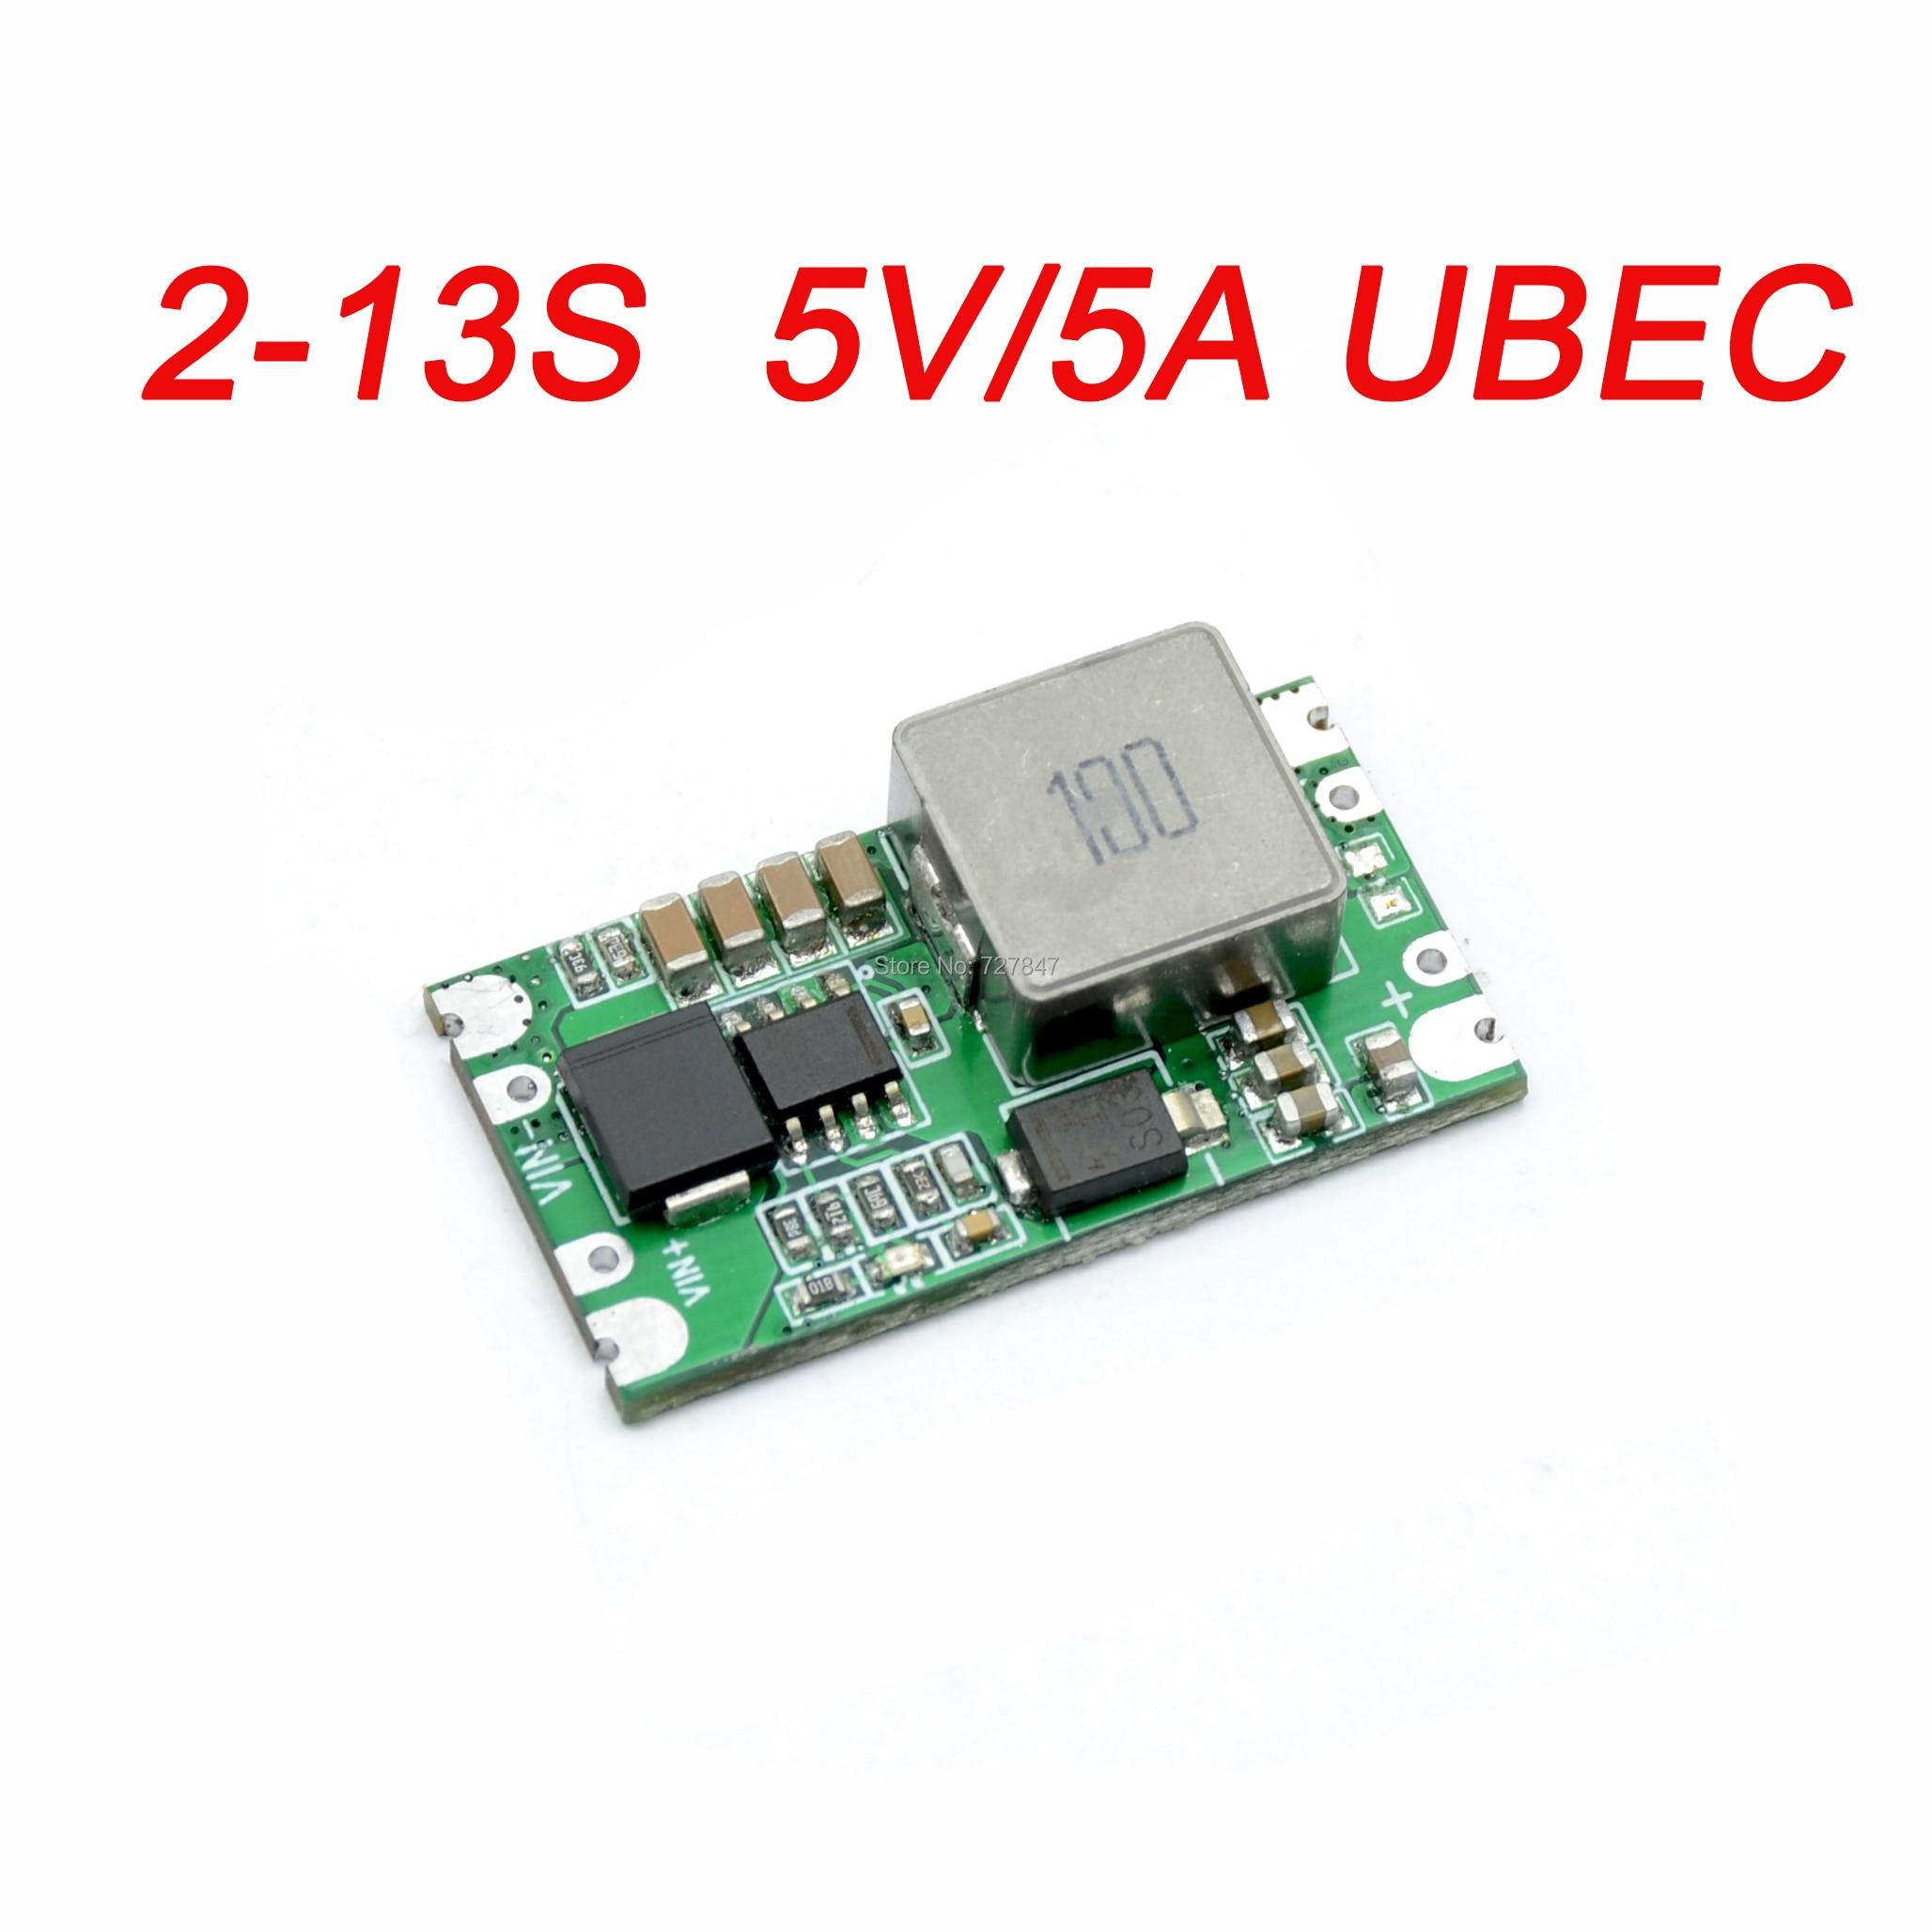 FPV Micro 5 V/5A 2-13 S BEC UBEC Mini 5 V 5A pour Drone RC quadrirotor